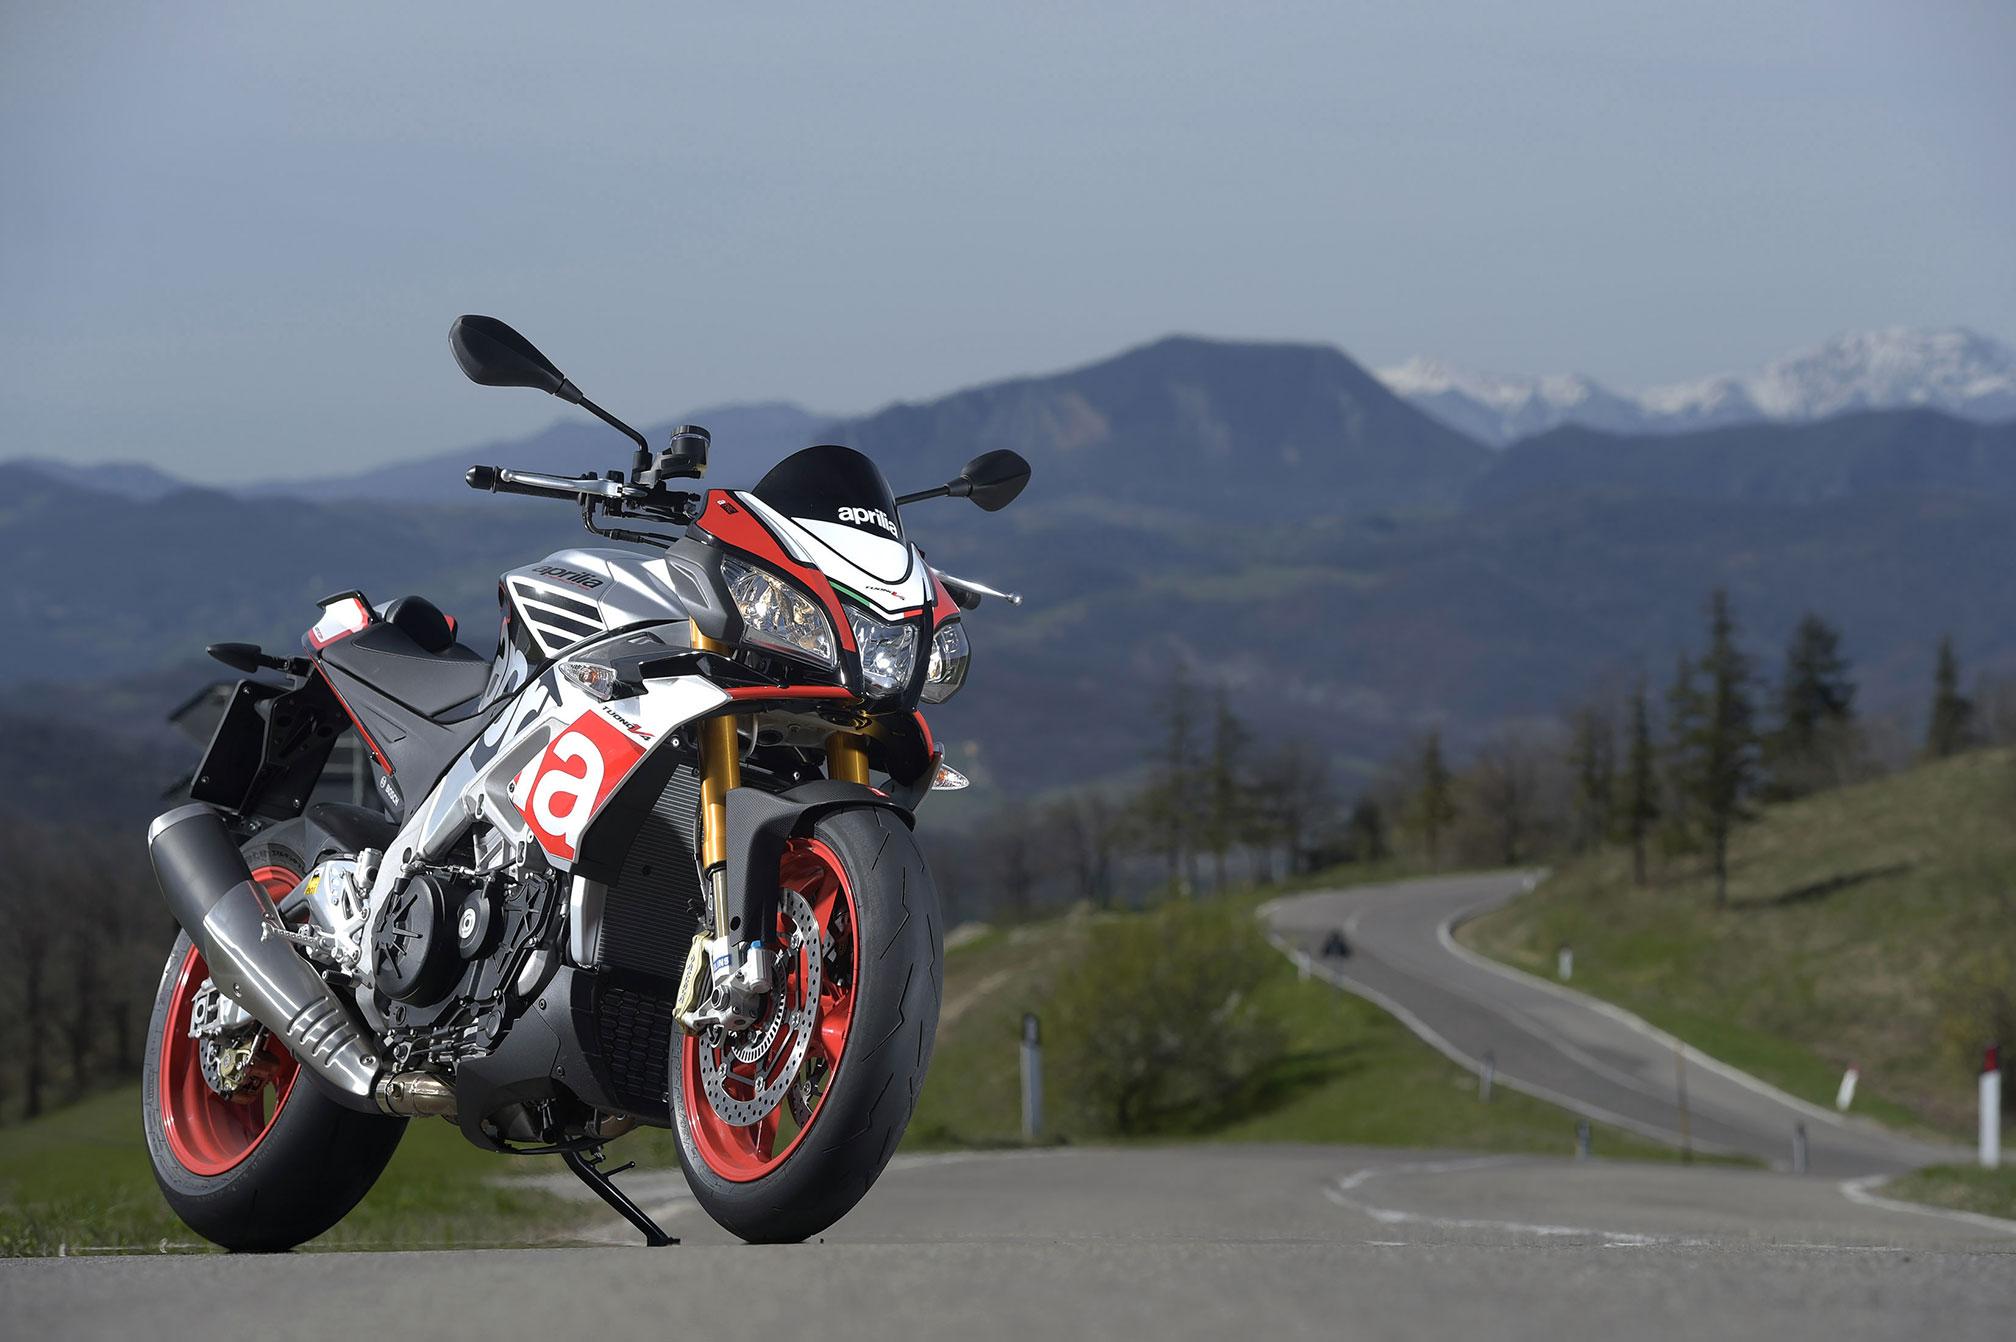 Aprilia Tuono V4 1100 – best import motorcycle